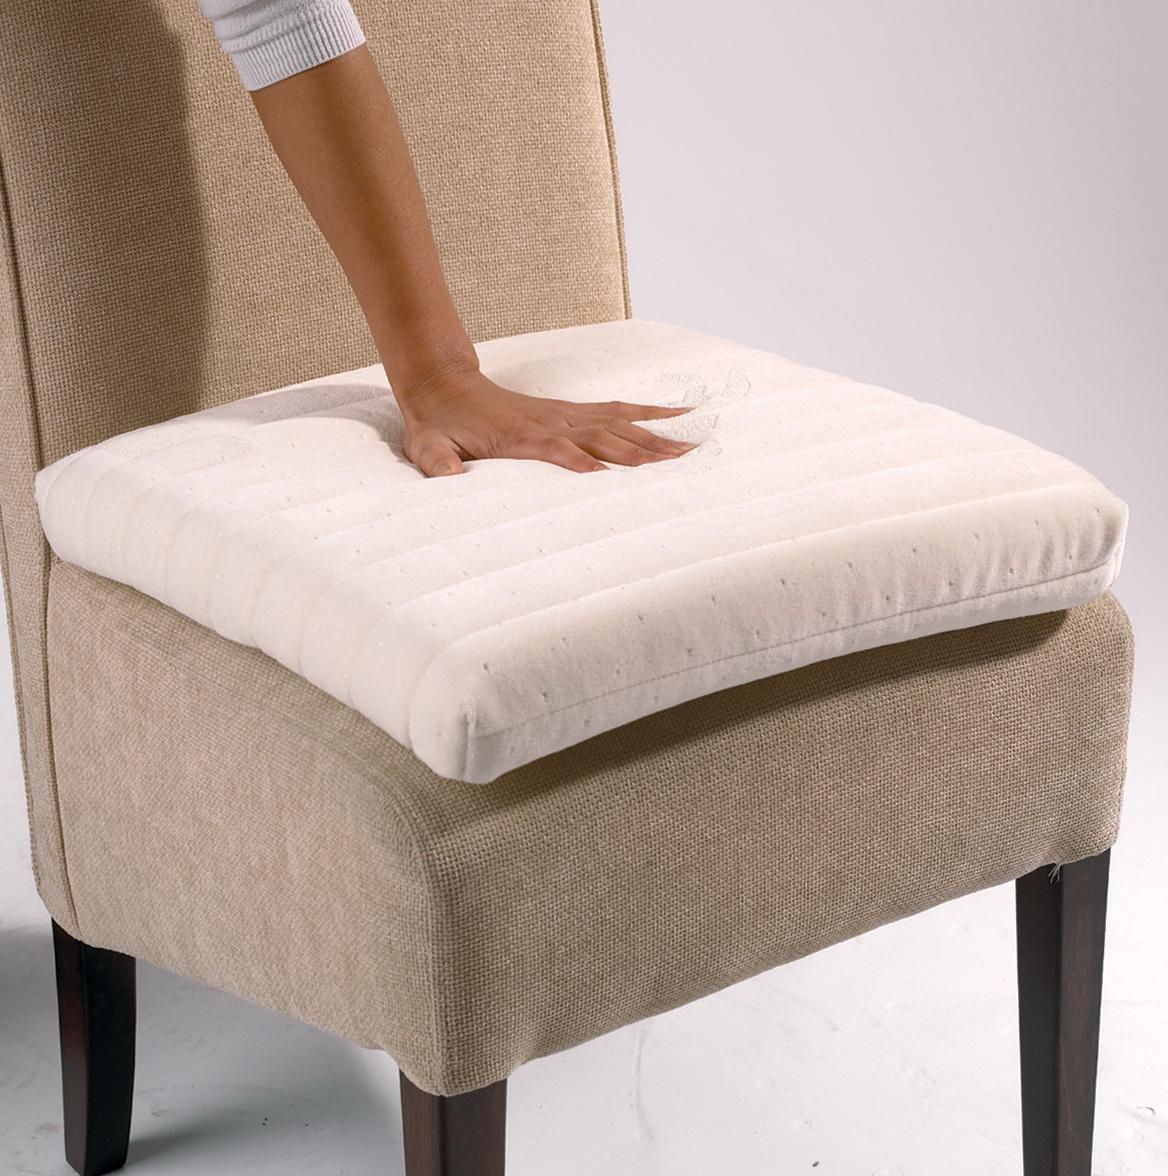 memory foam chair cushion home design ideas. Black Bedroom Furniture Sets. Home Design Ideas